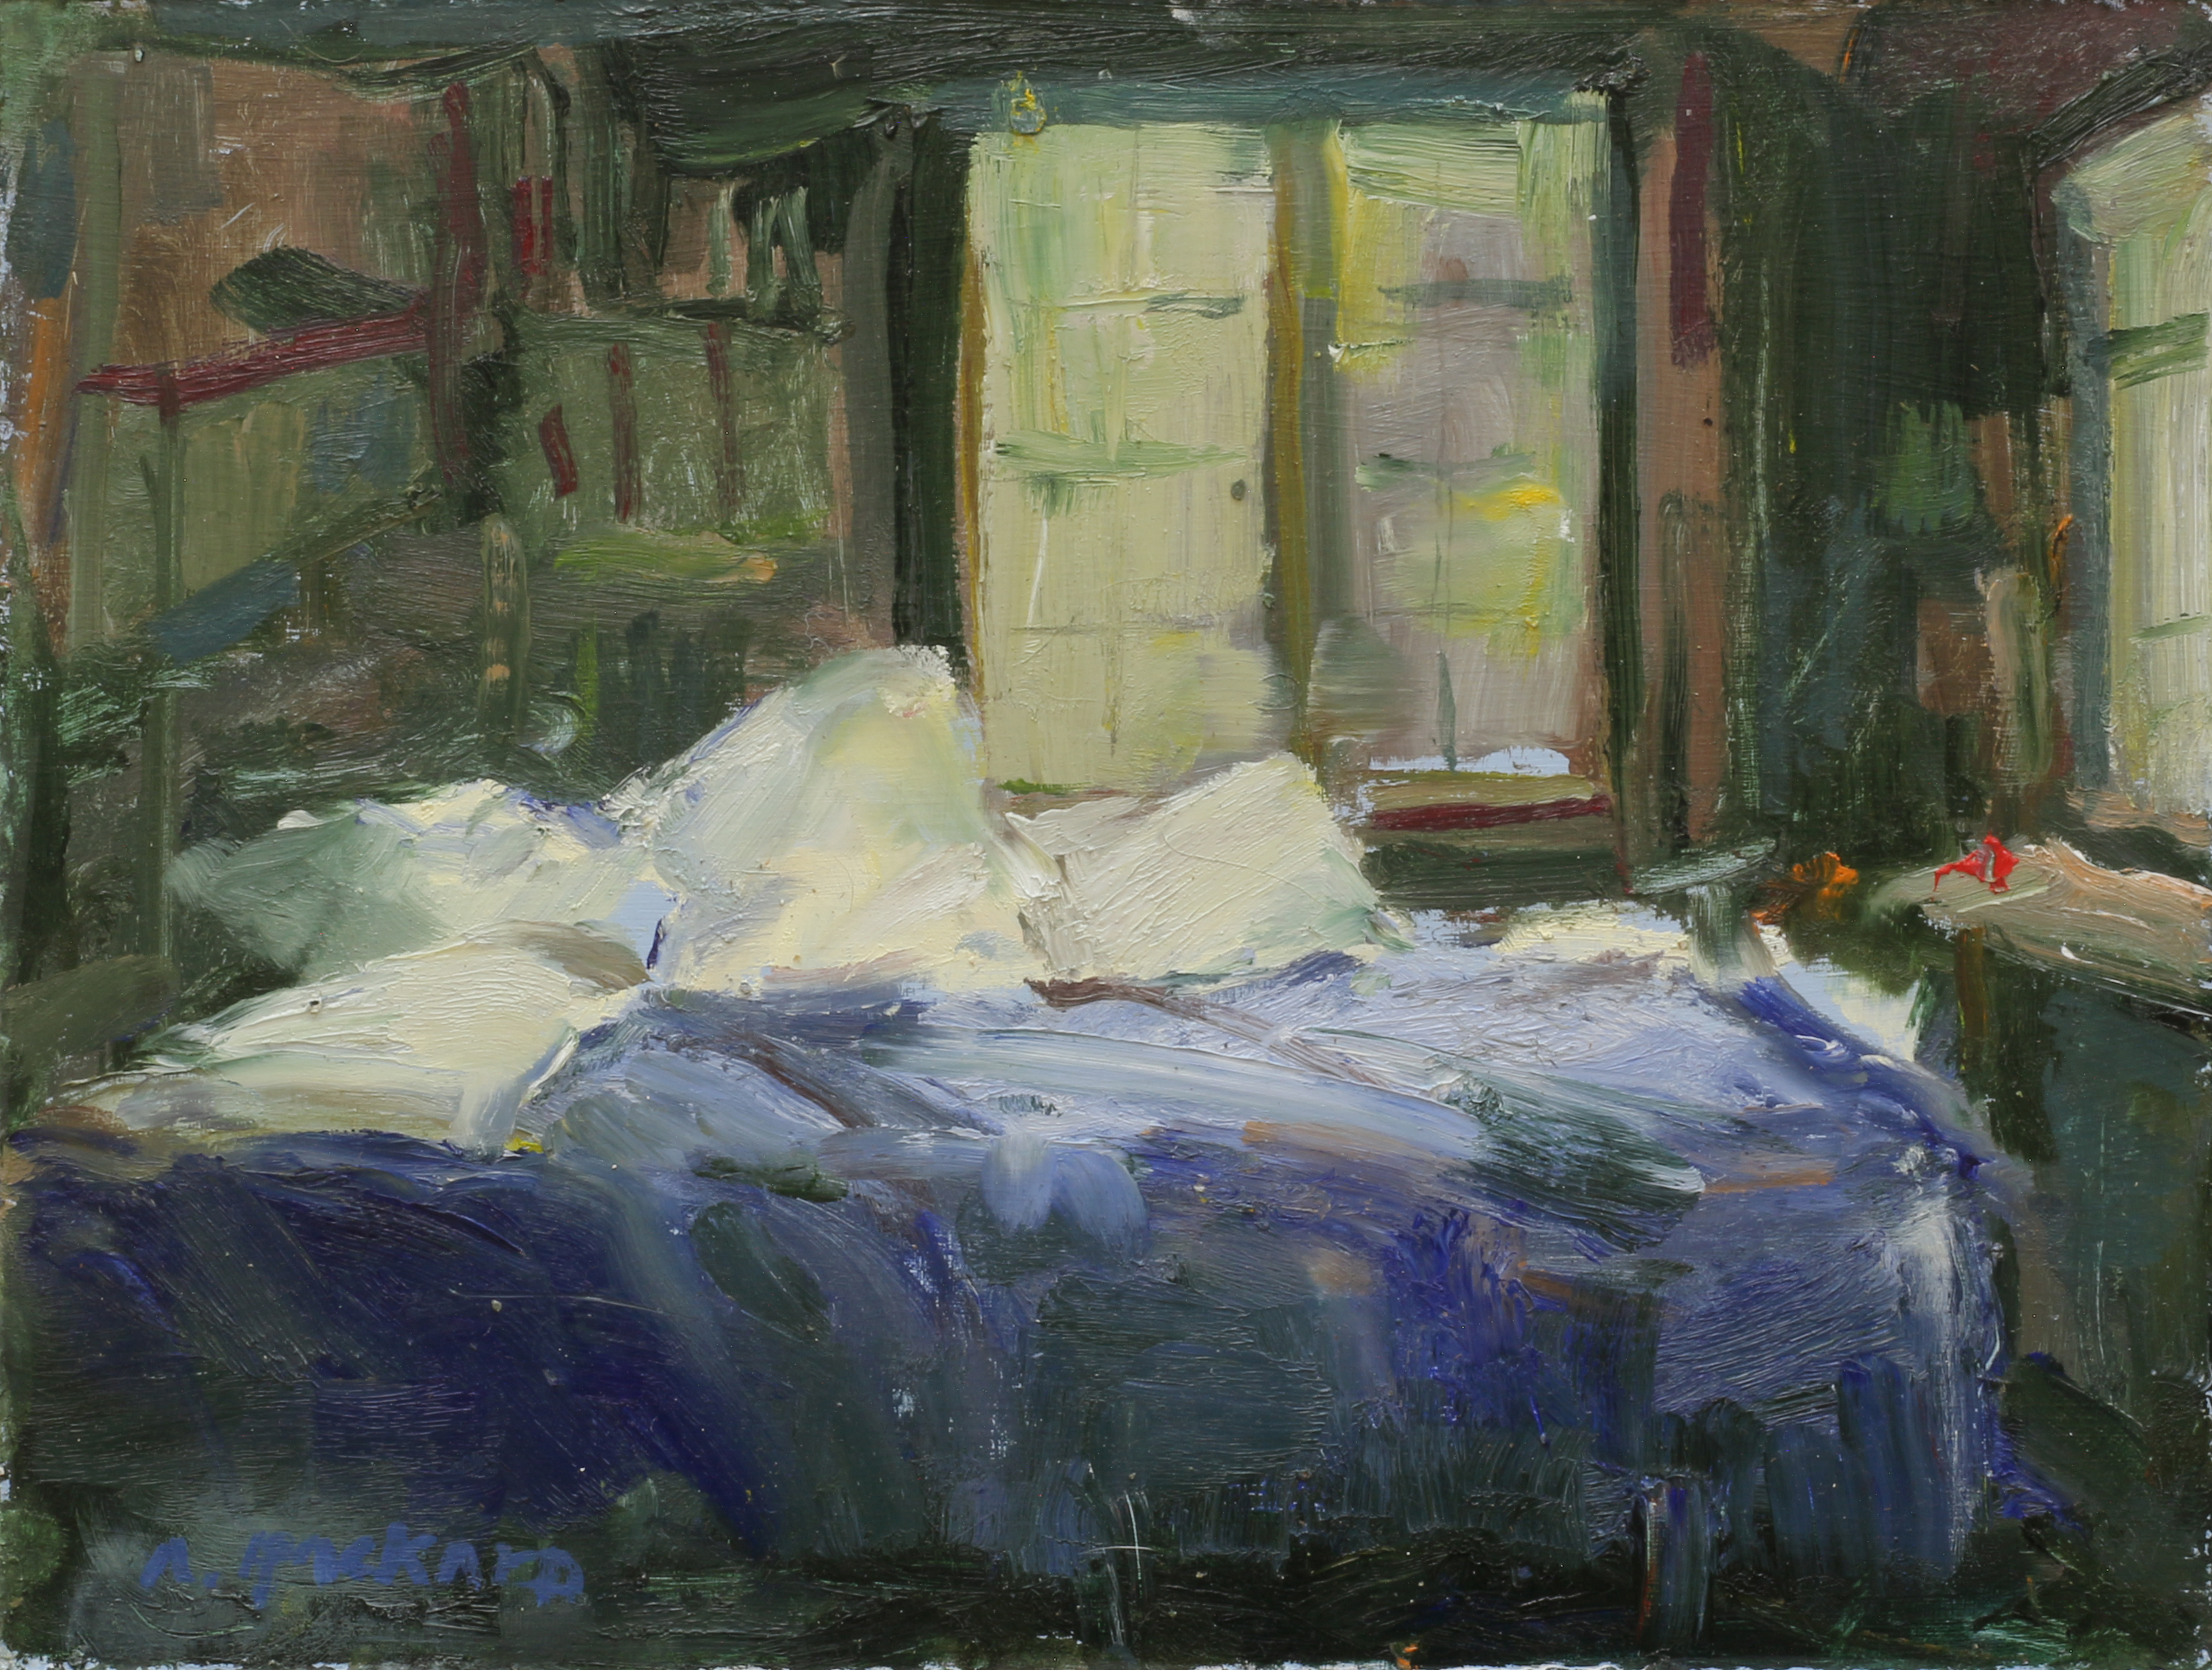 Anne Packard - Blue Mood